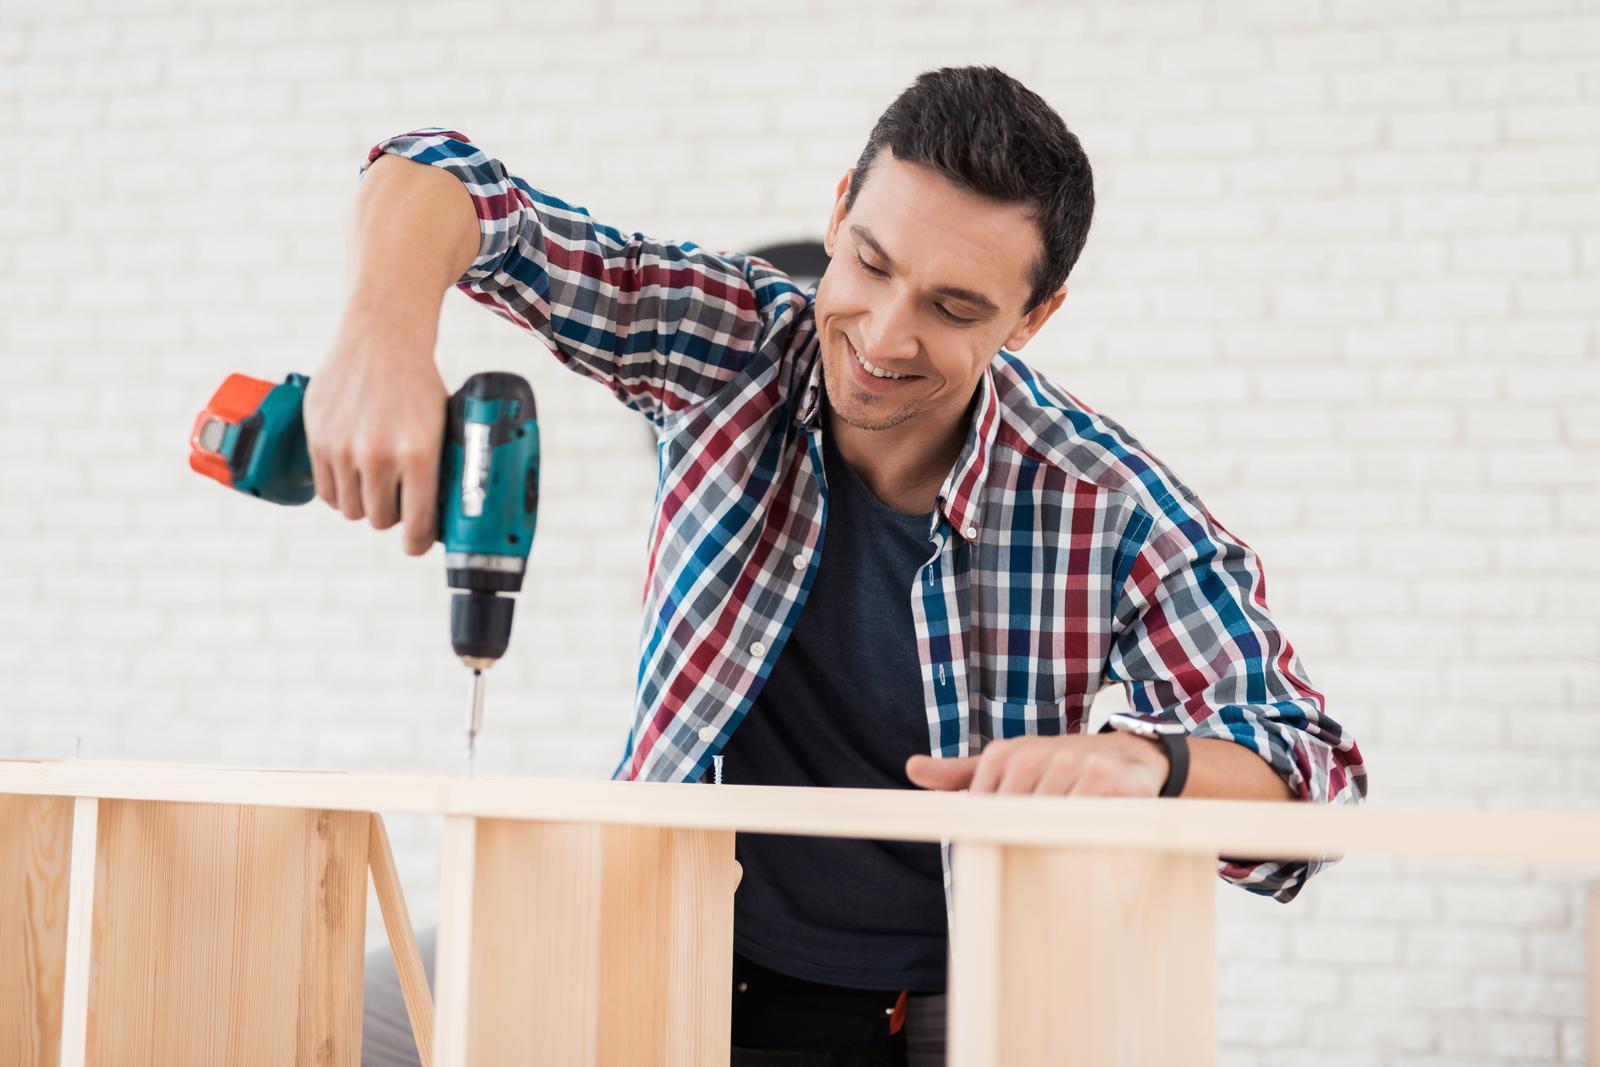 Repair of furniture and home furnishings in Ida-Viru county